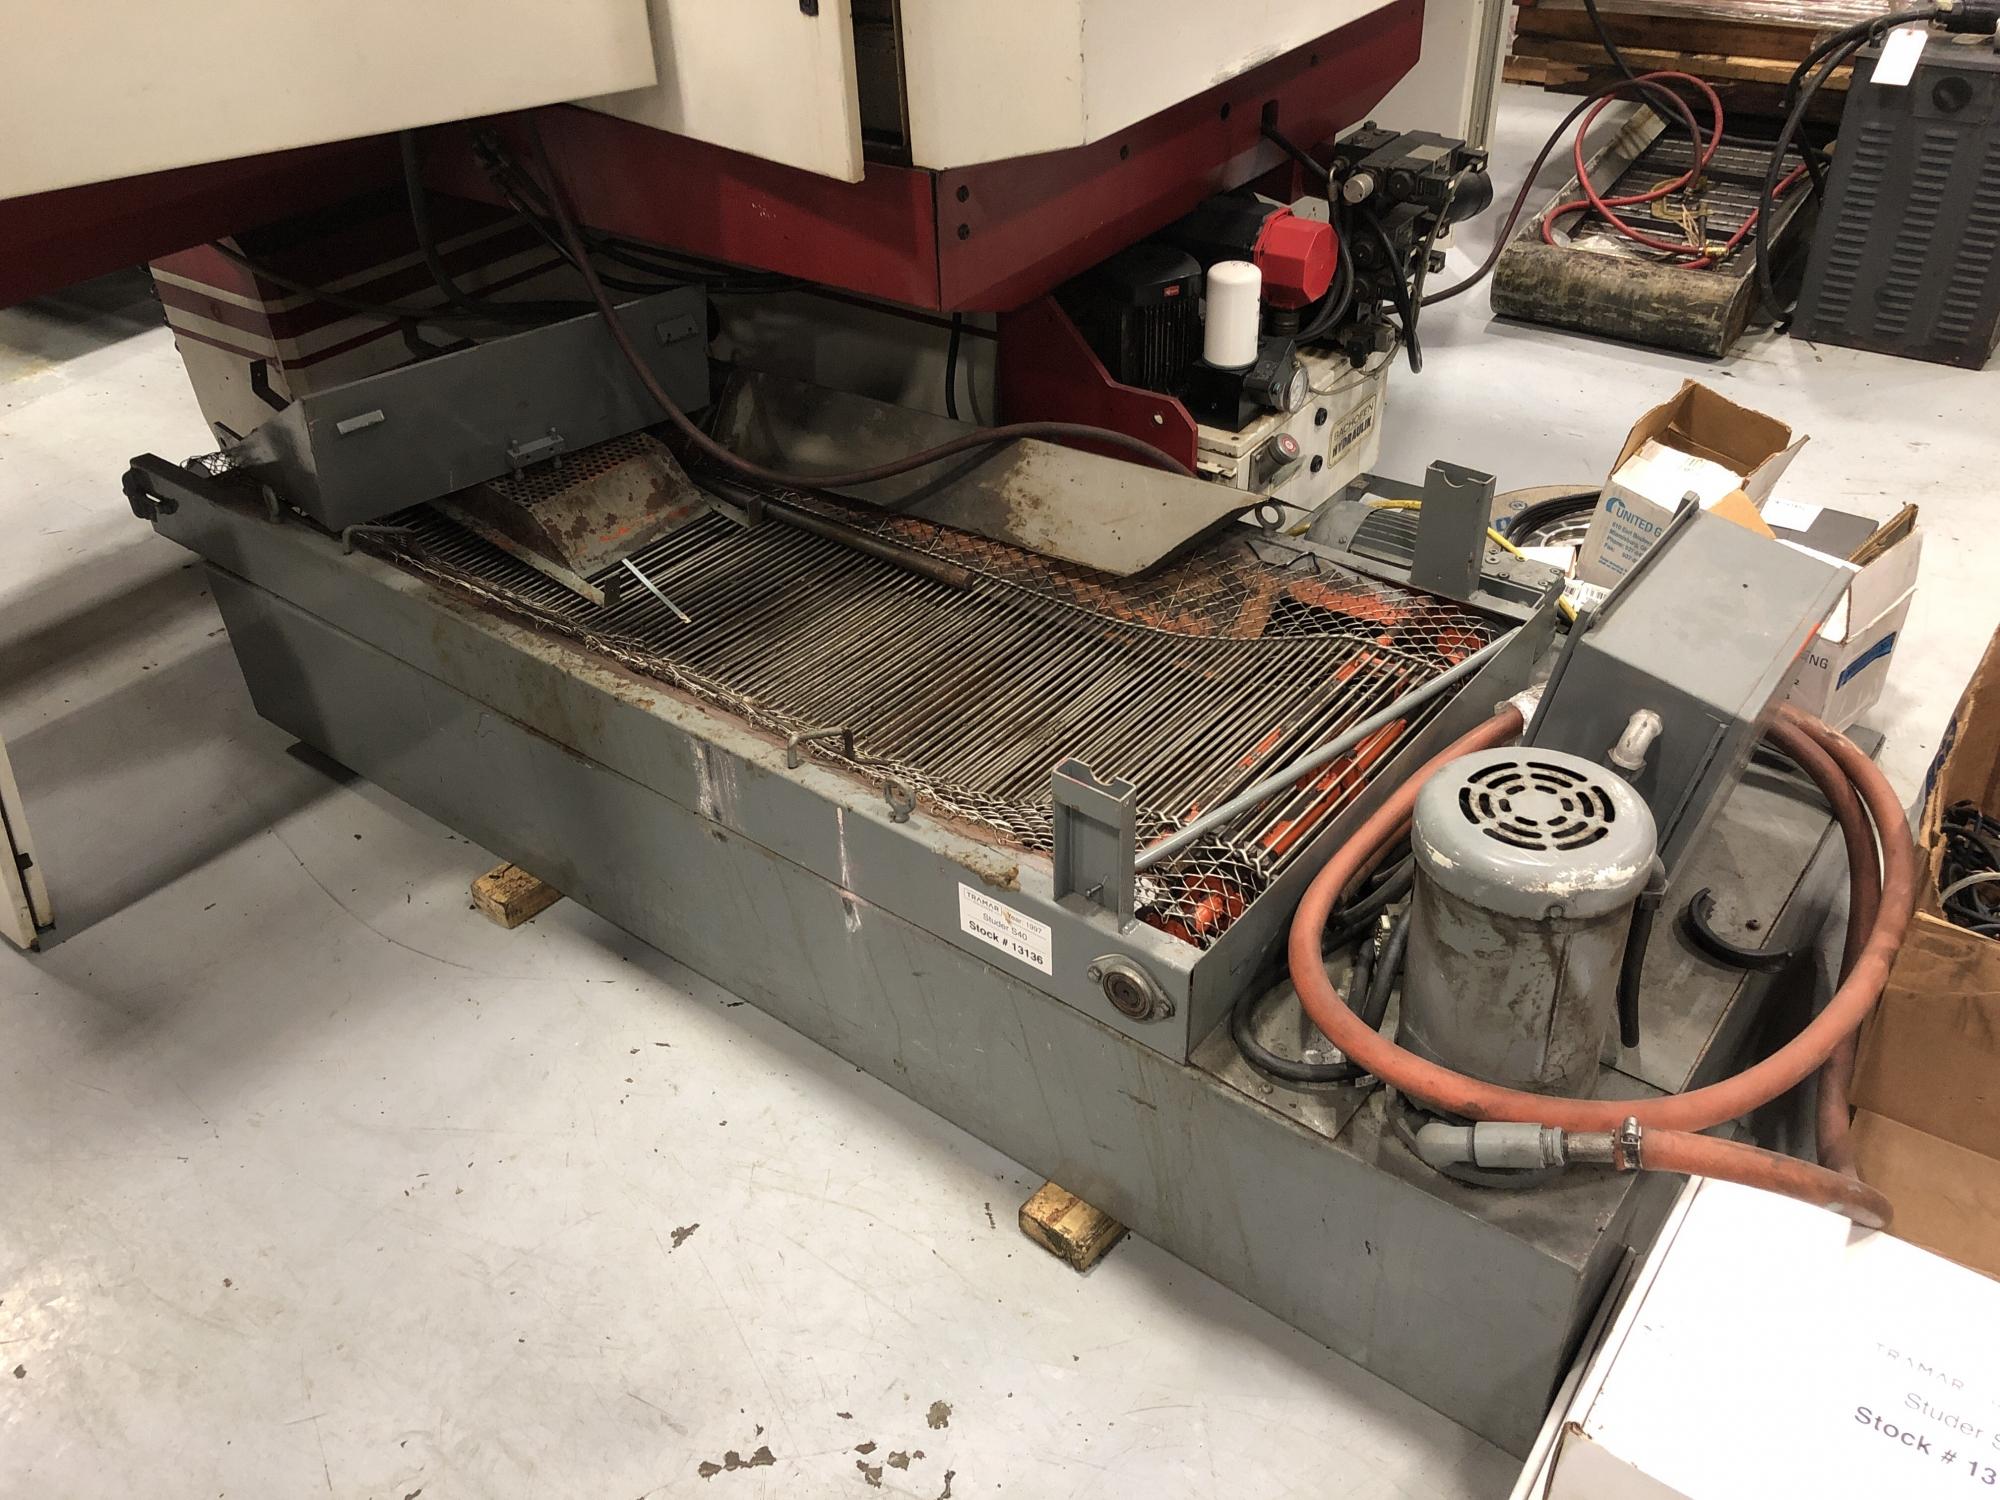 1997 STUDER S40 OD/ID - CNC Cylidrical Grinder